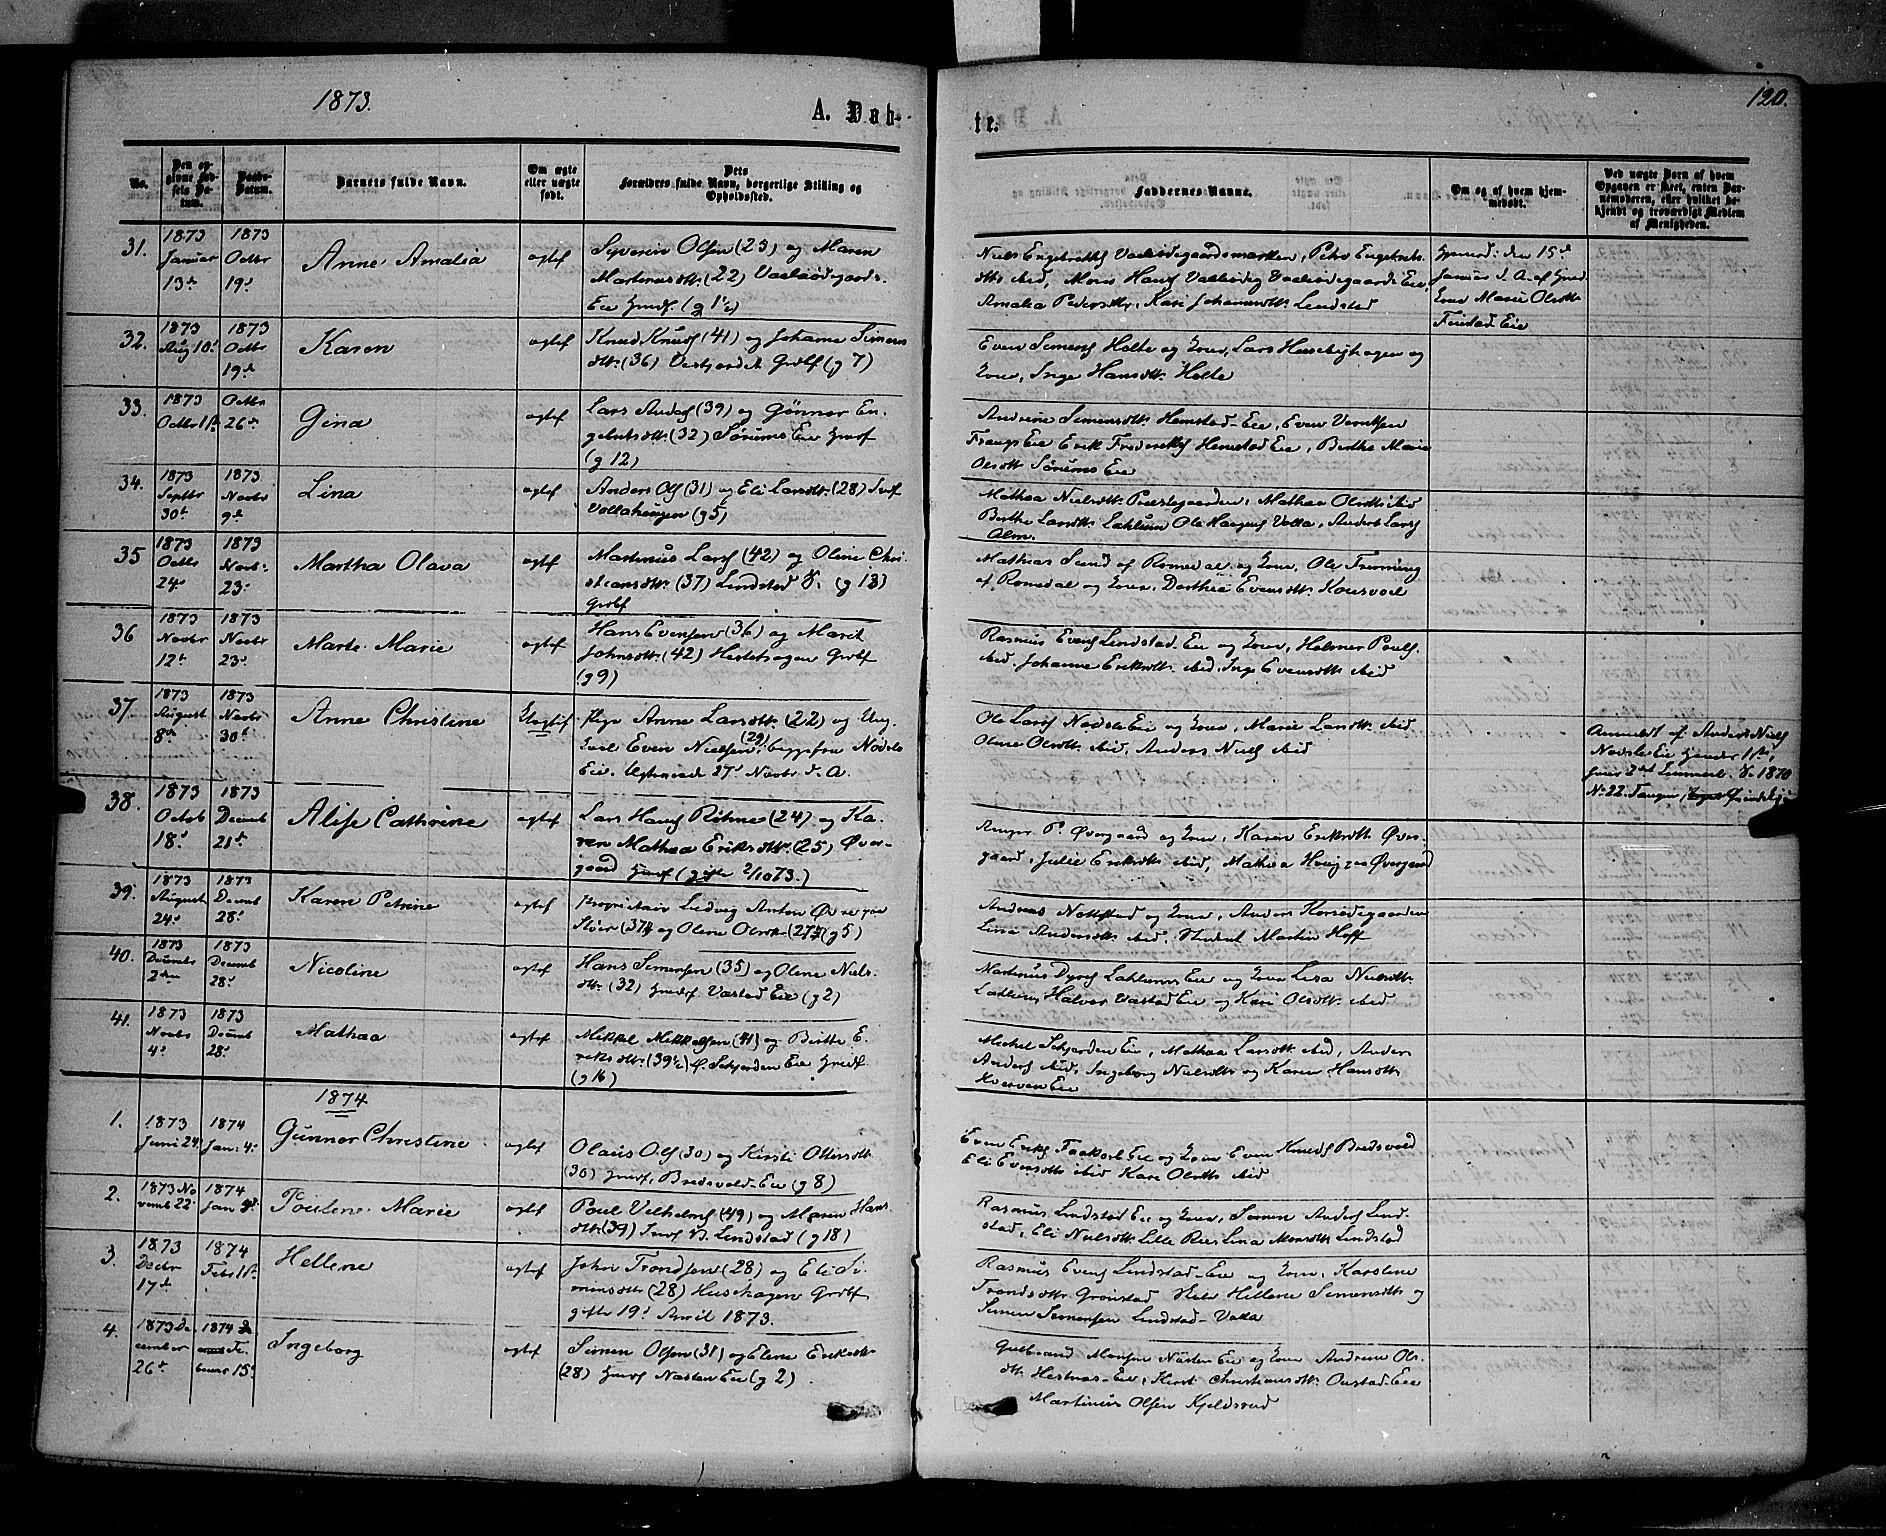 SAH, Stange prestekontor, K/L0013: Ministerialbok nr. 13, 1862-1879, s. 120